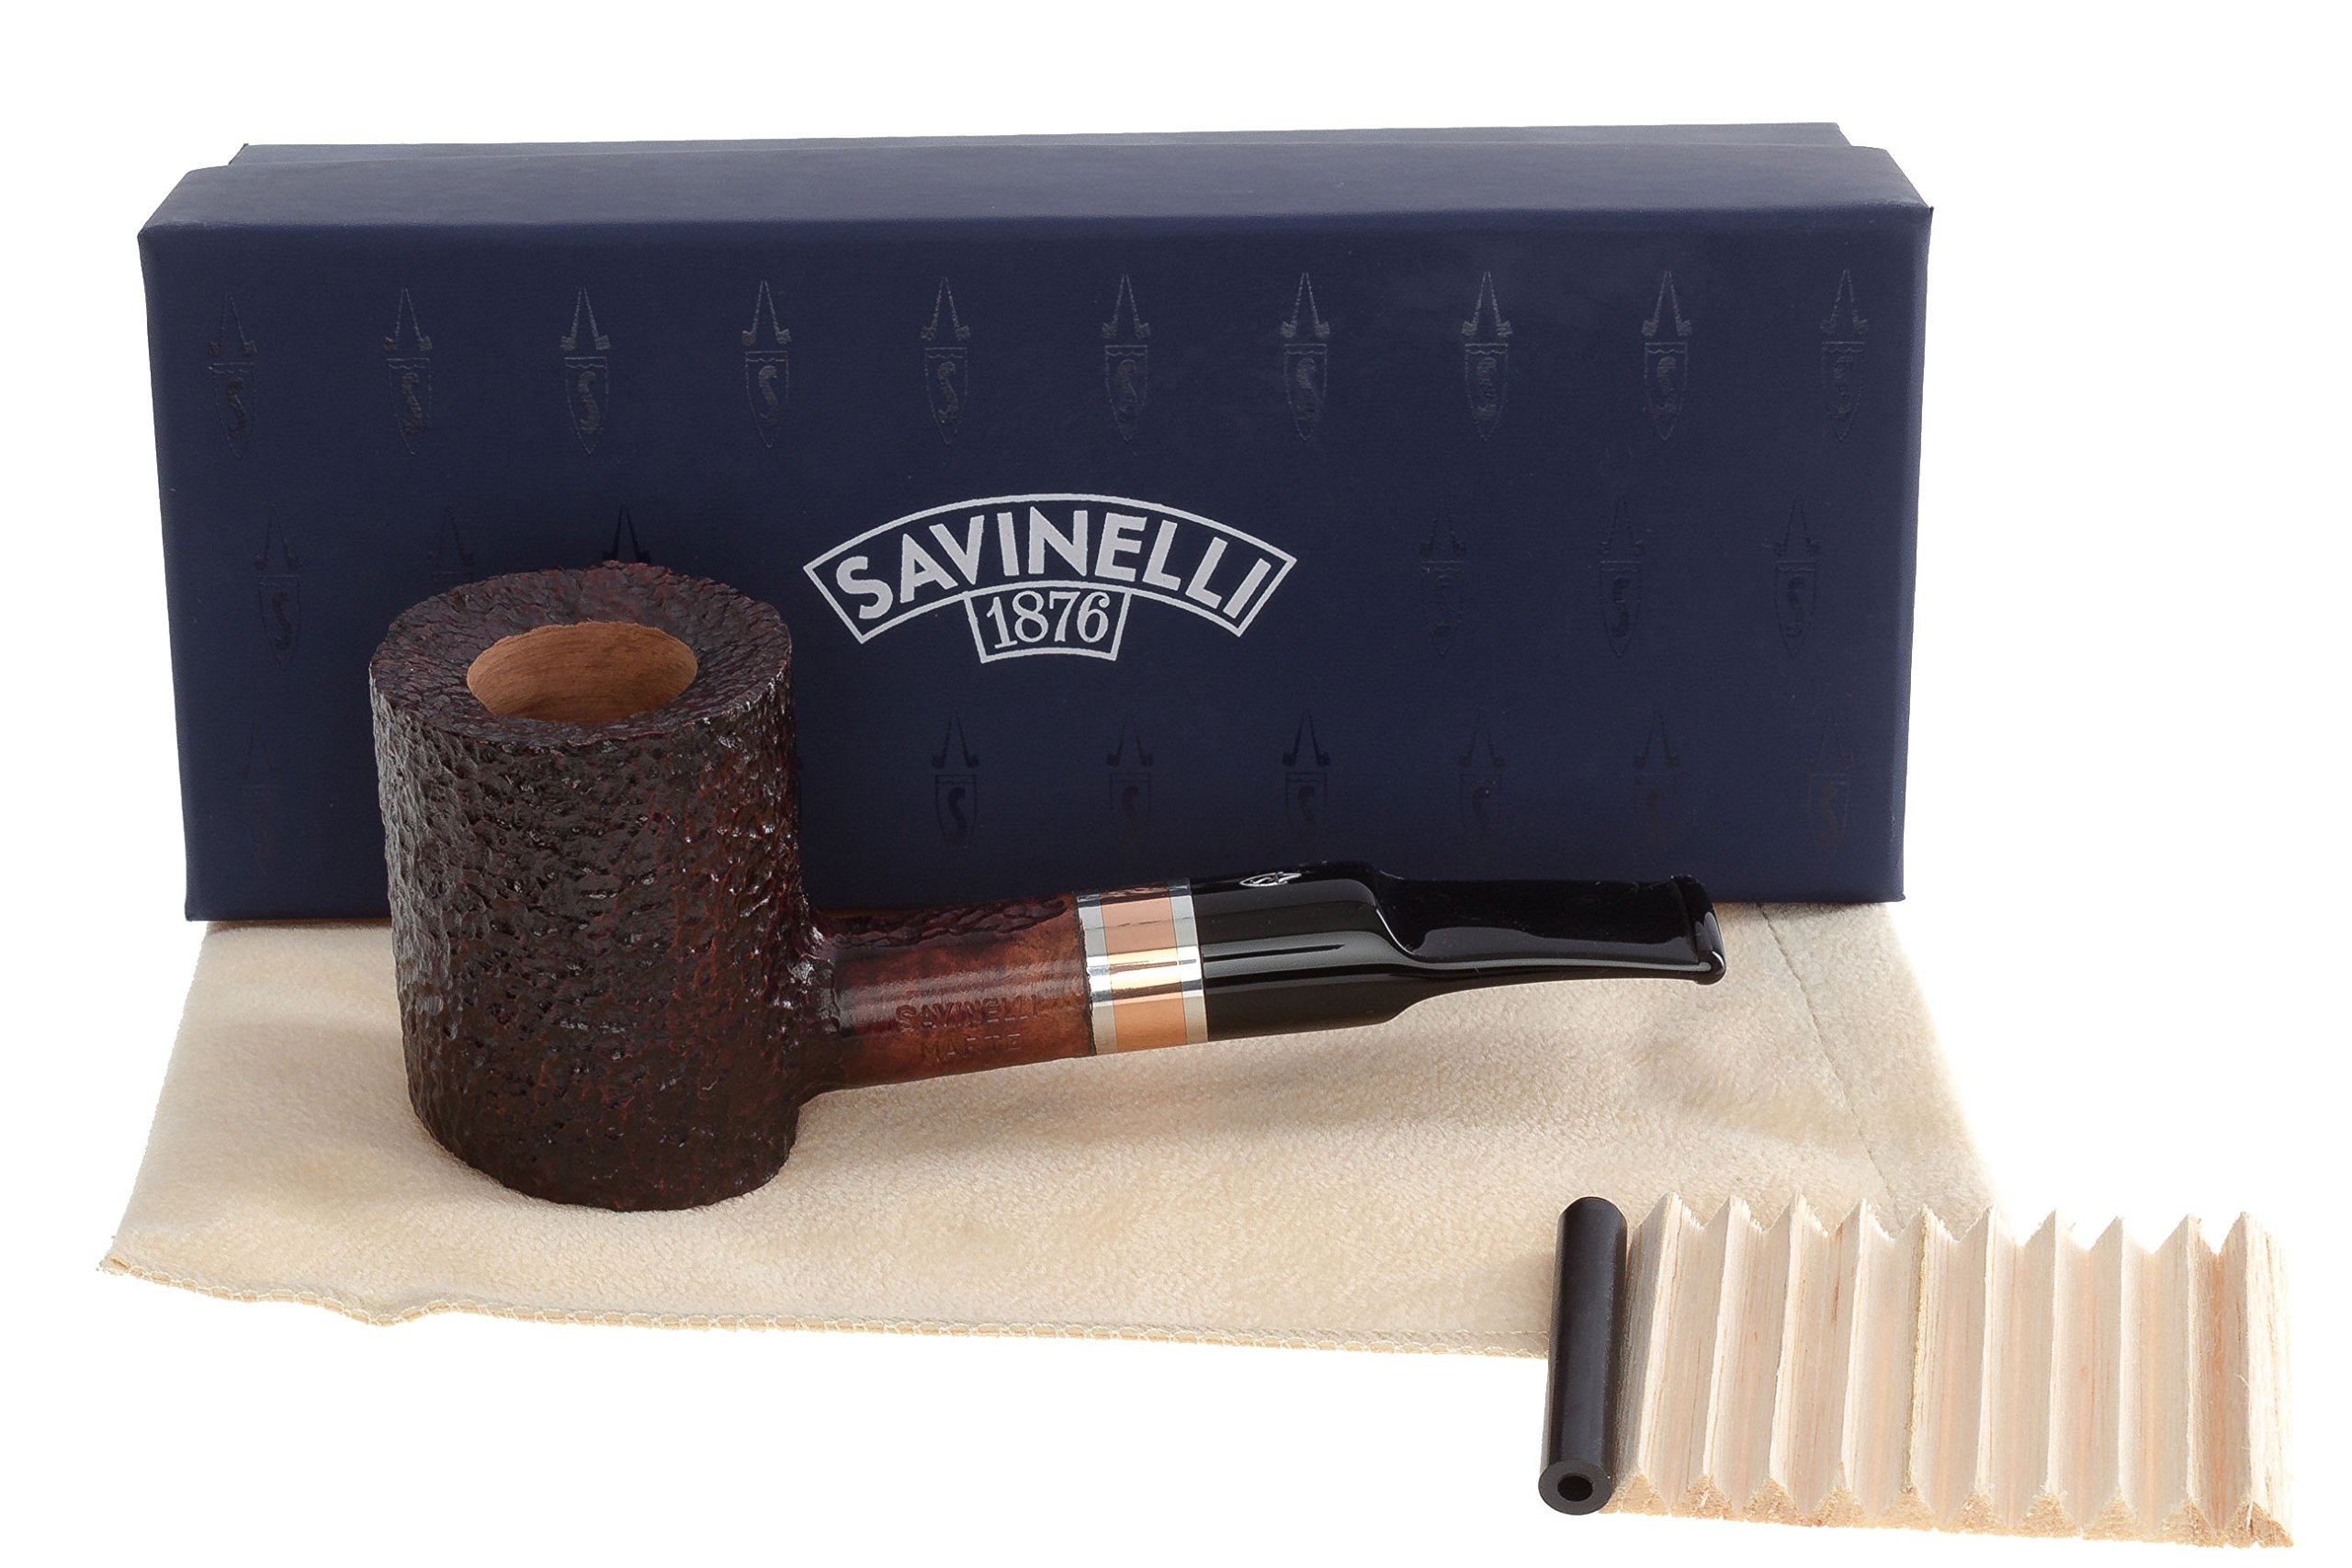 Savinelli Marte 311 KS Tobacco Pipe - Rustic